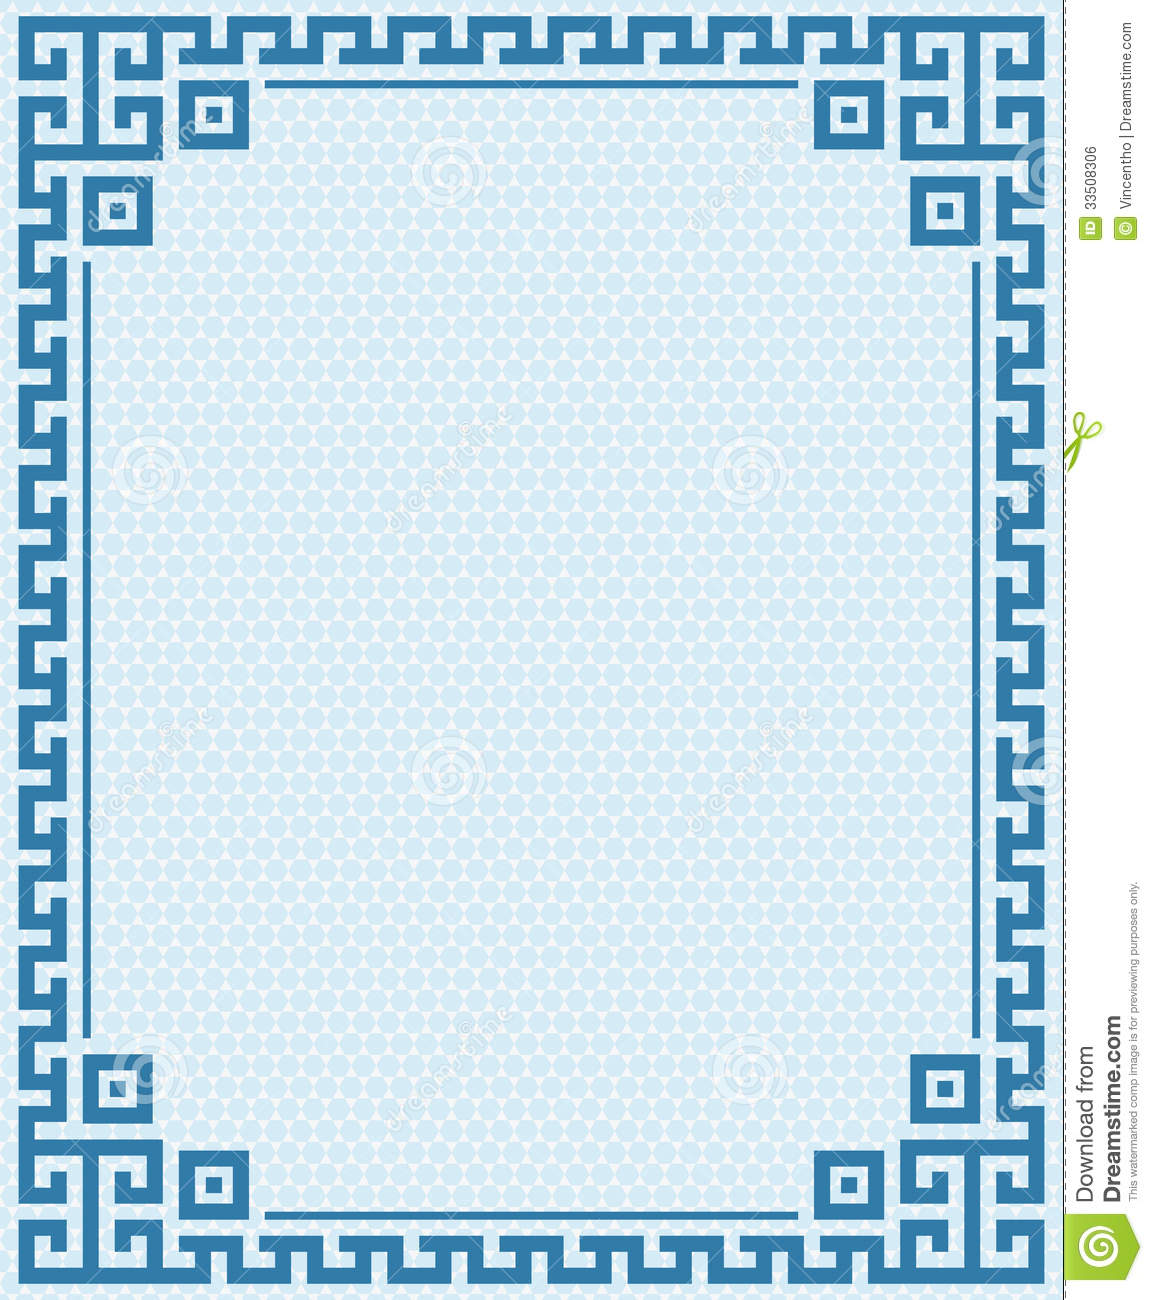 Greek Key Border Clip Art Greek key border frame sea 1153x1300